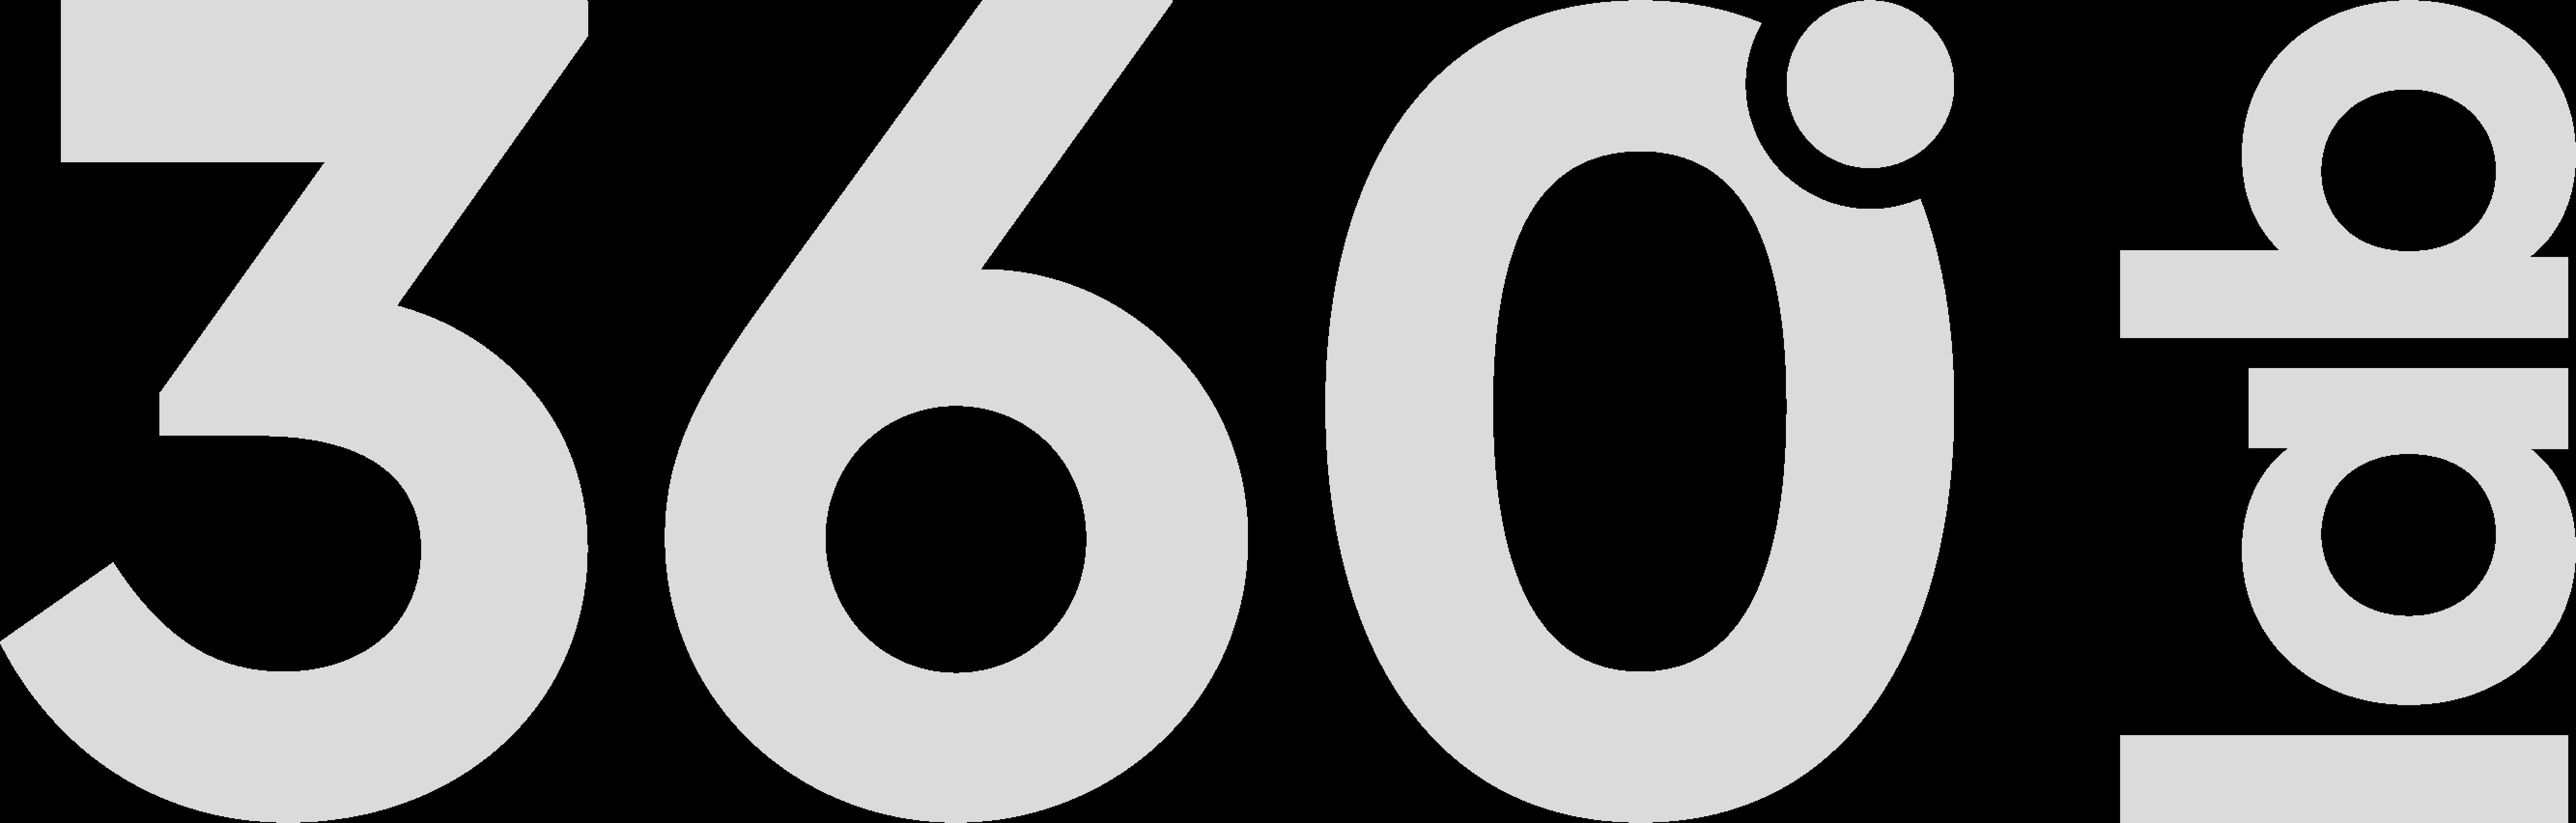 360 lab logo